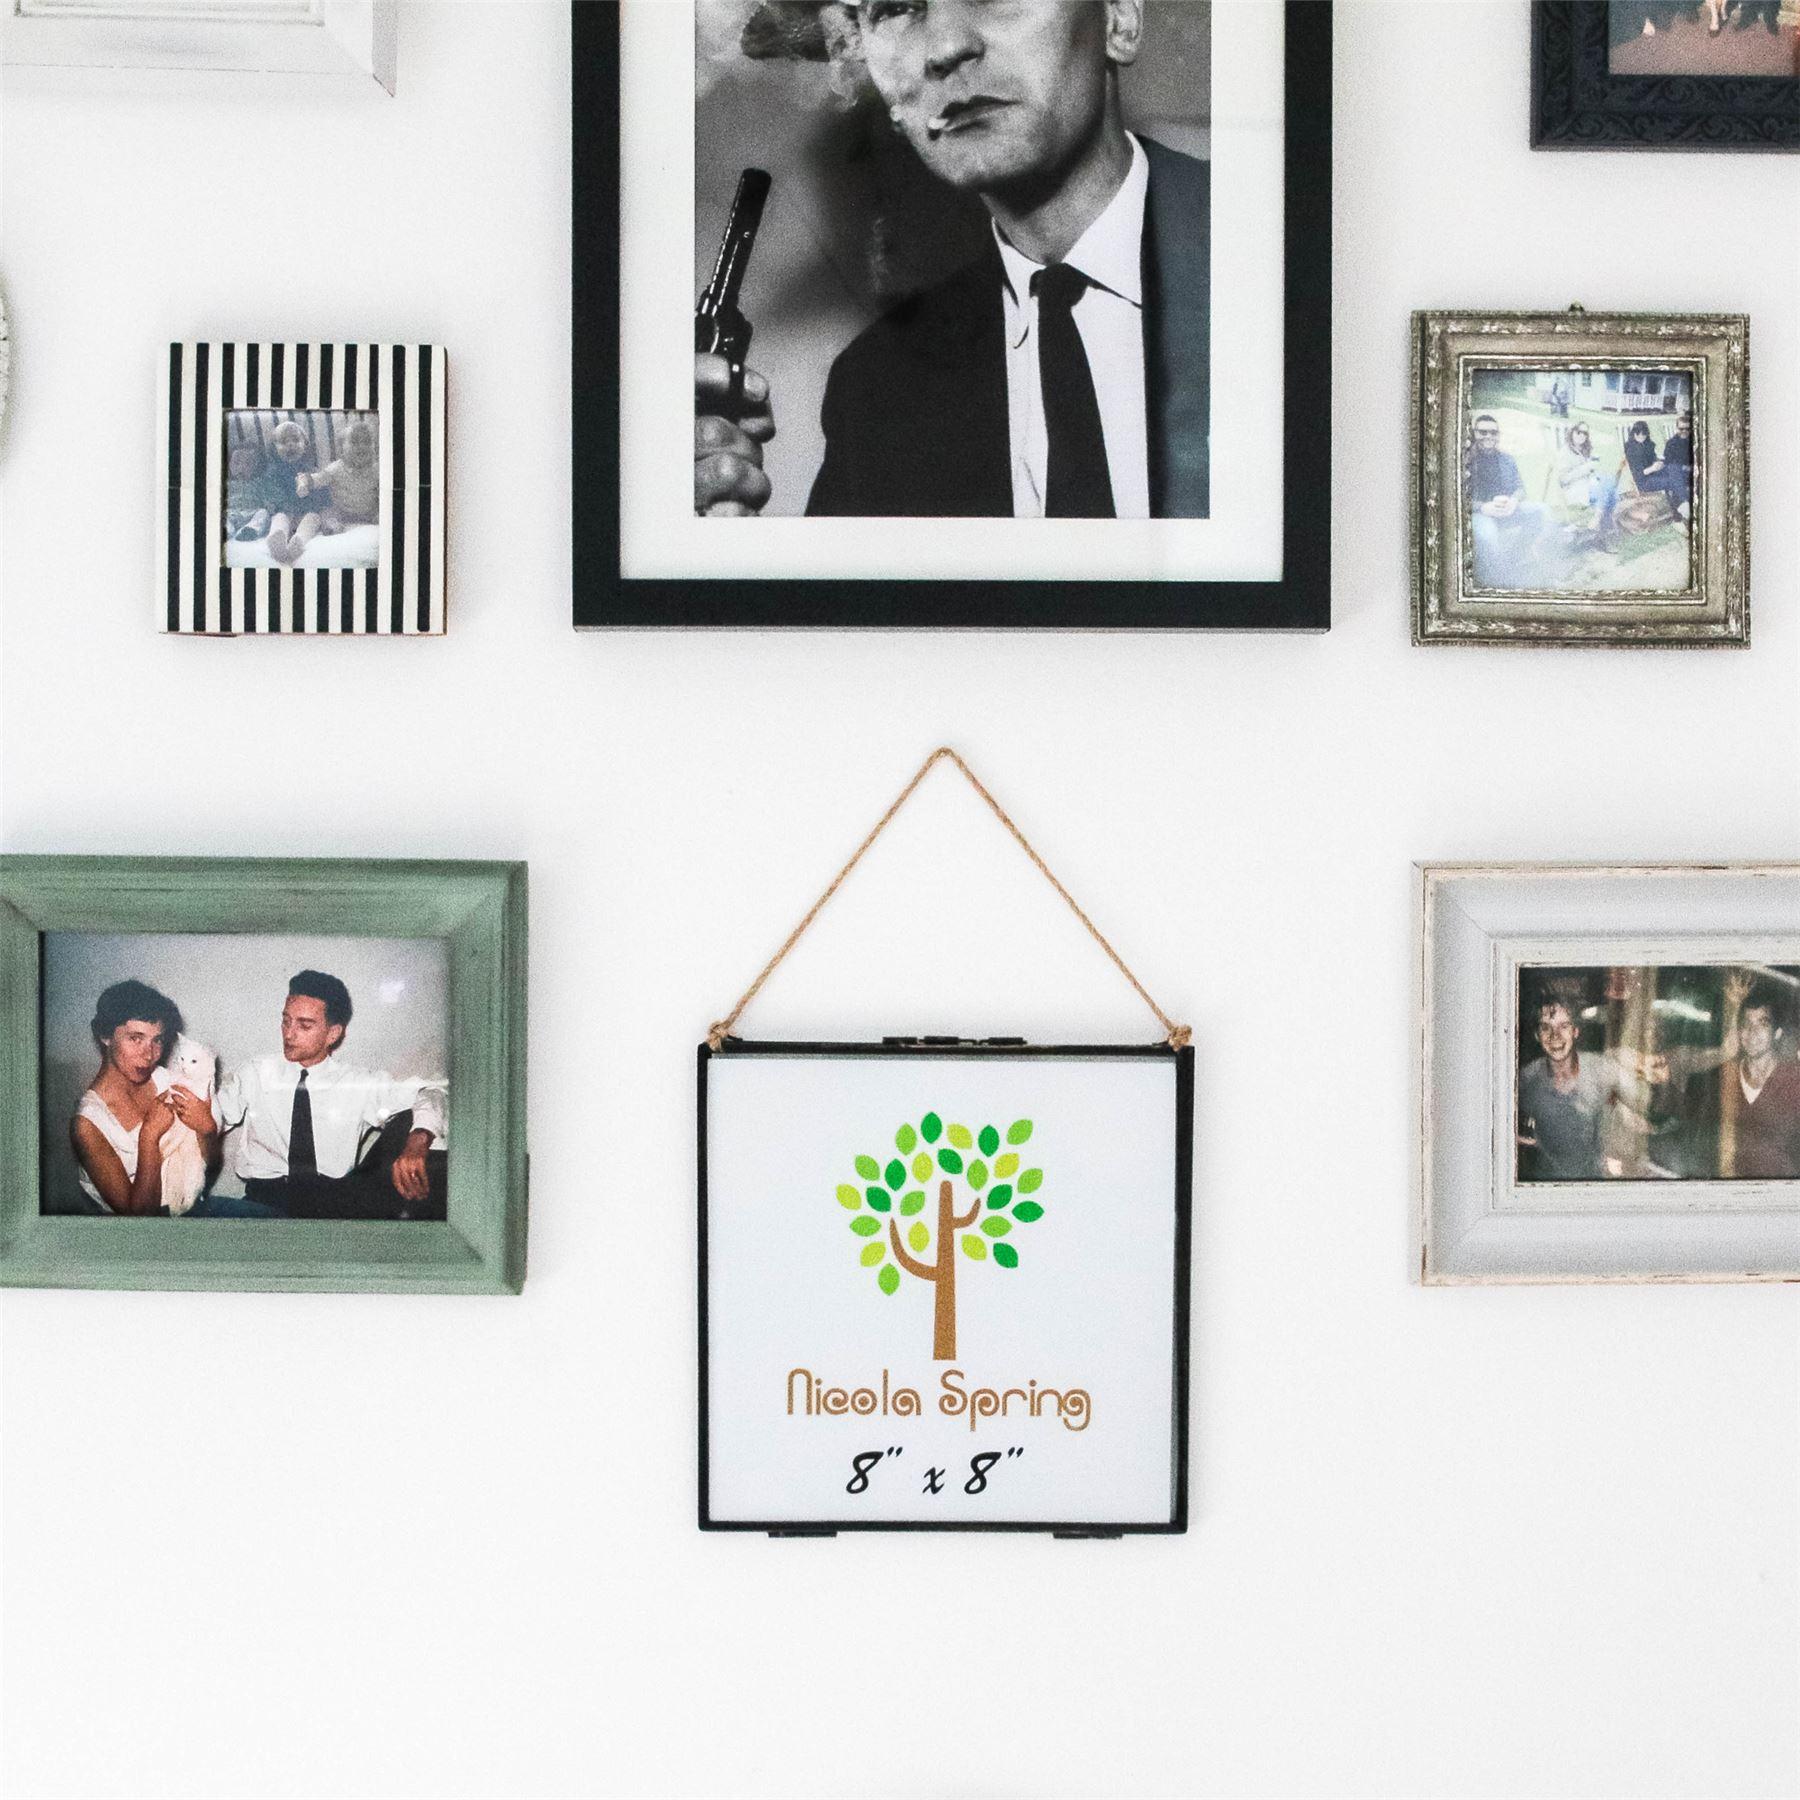 cadre photo accrocher vintage cadre photo en metal et. Black Bedroom Furniture Sets. Home Design Ideas